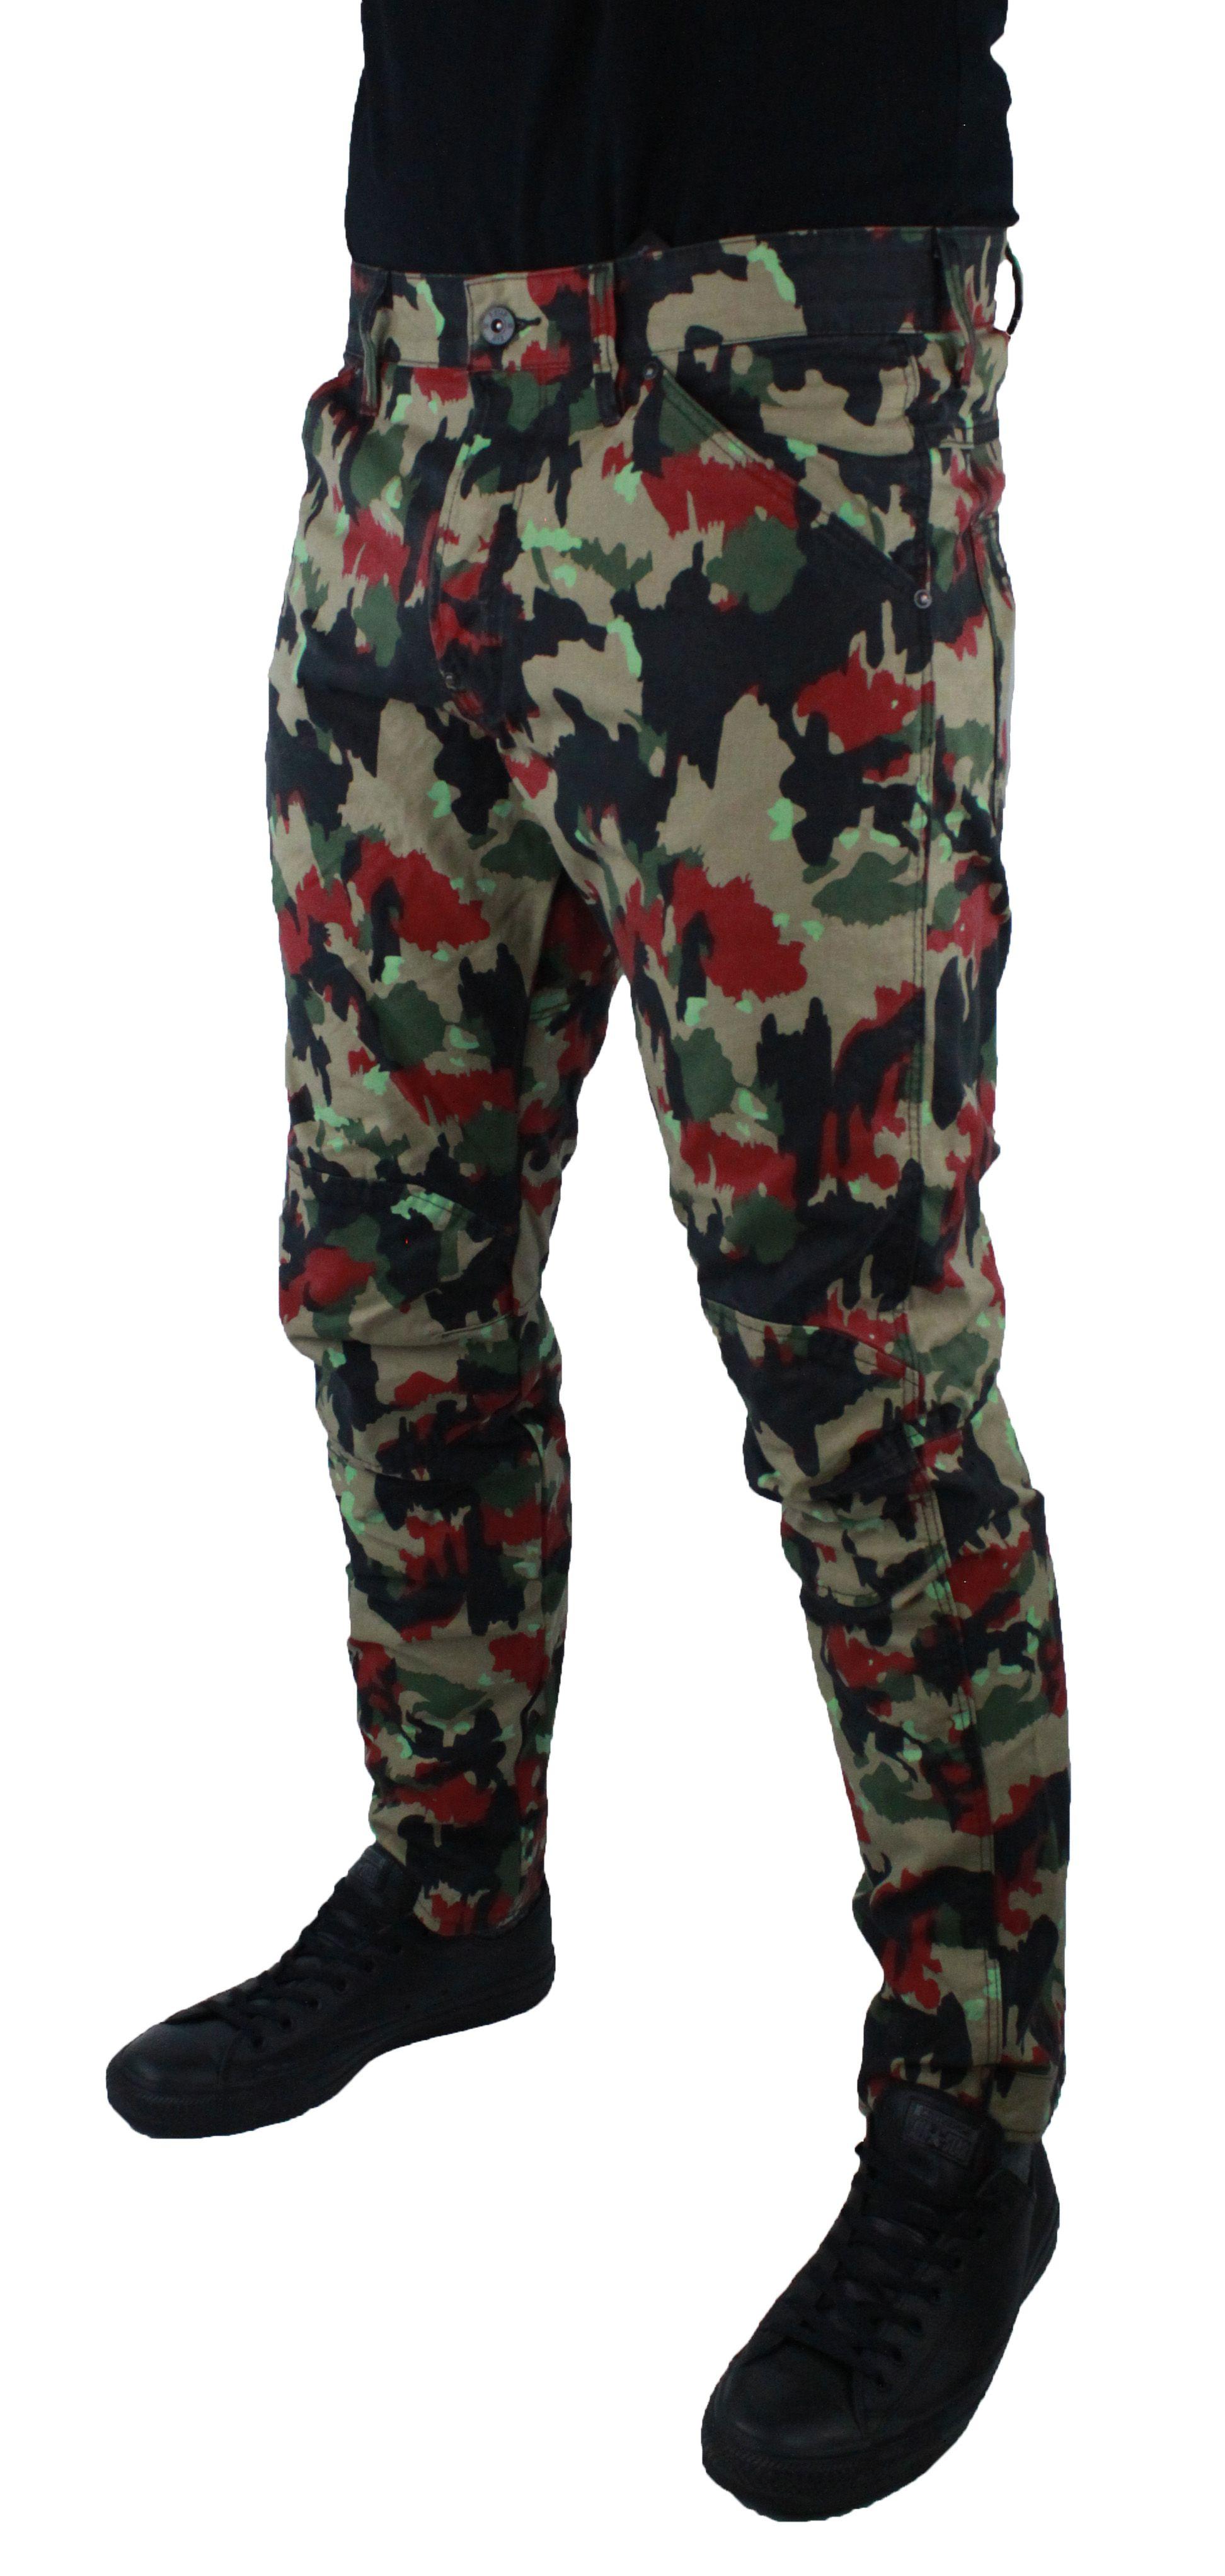 G-Star 5622 3D Tapeerd COJ Camo 8481 Jeans